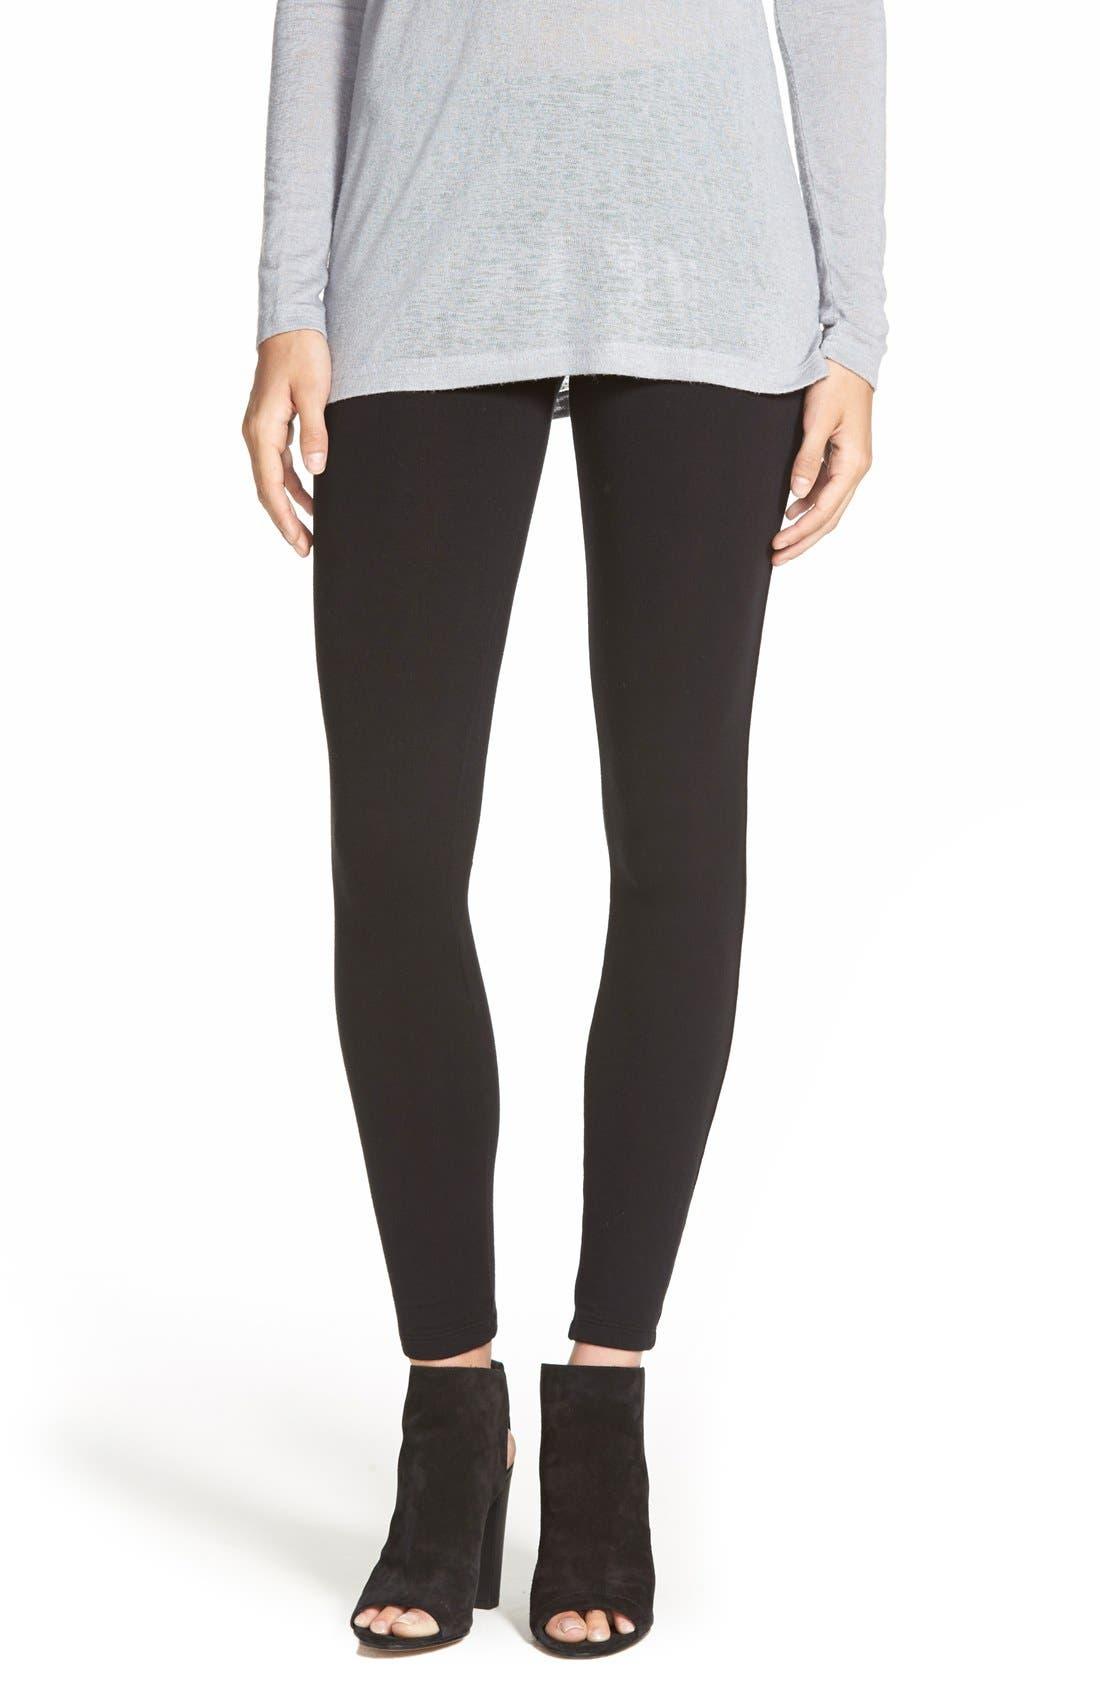 SPLENDID Stretch Cotton Leggings, Main, color, 001